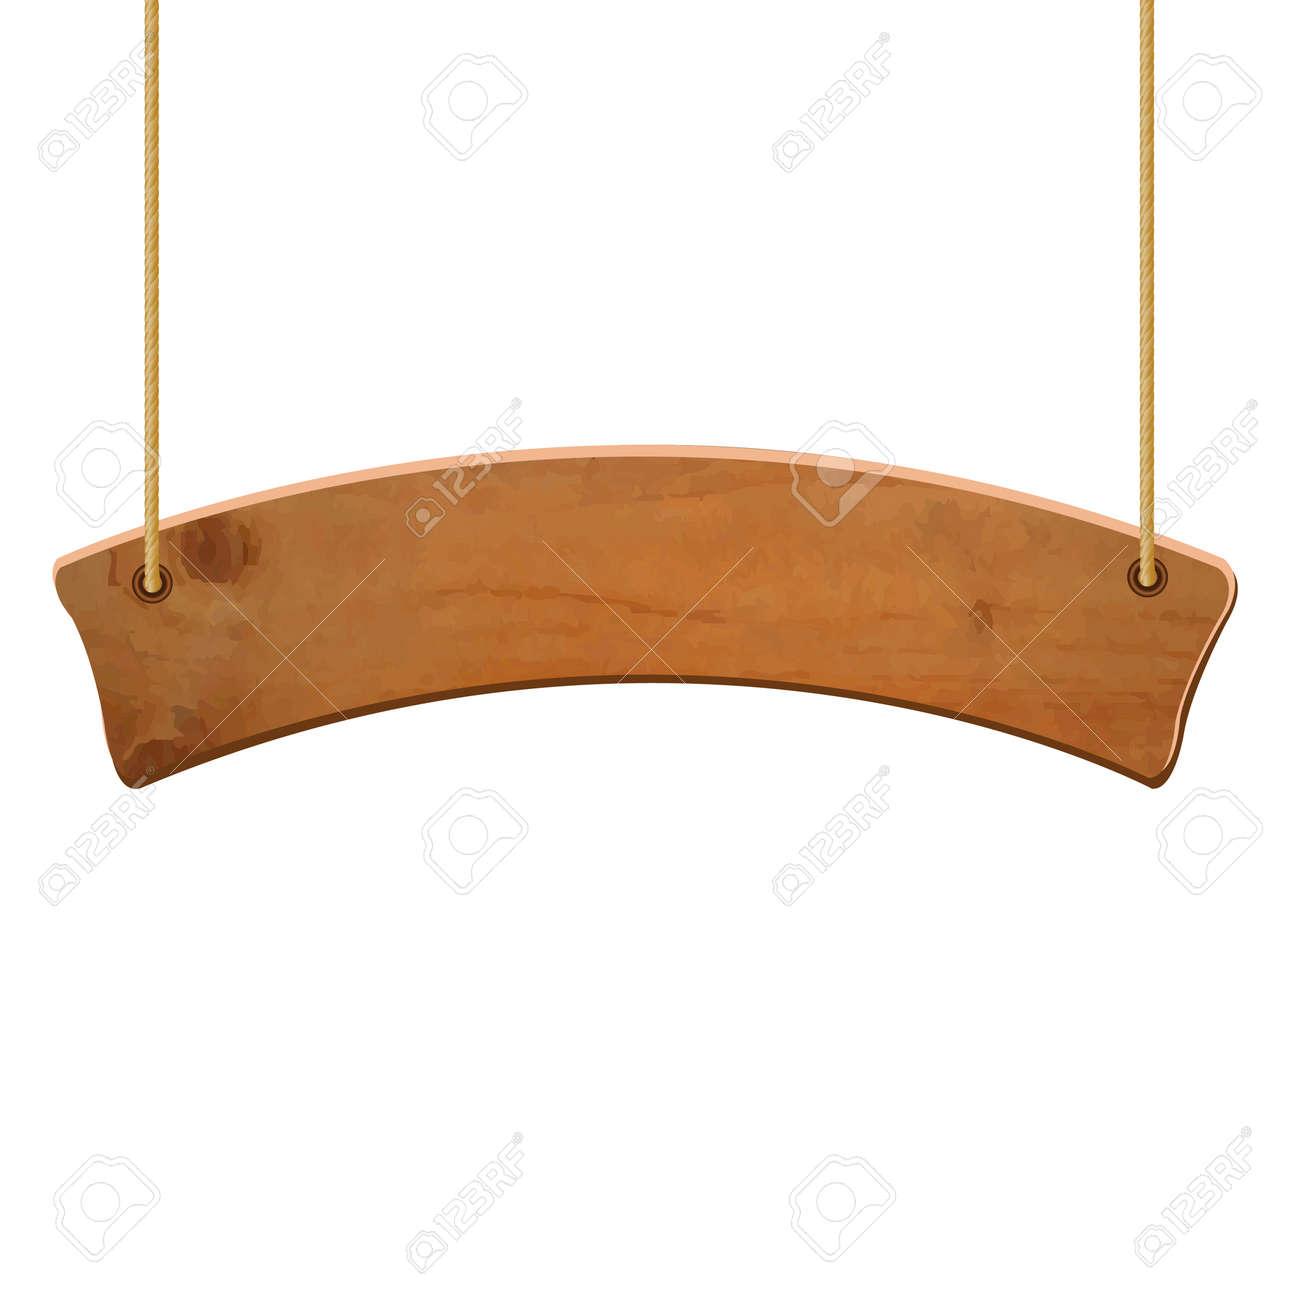 Wooden Sign, Vector Illustration - 30220739